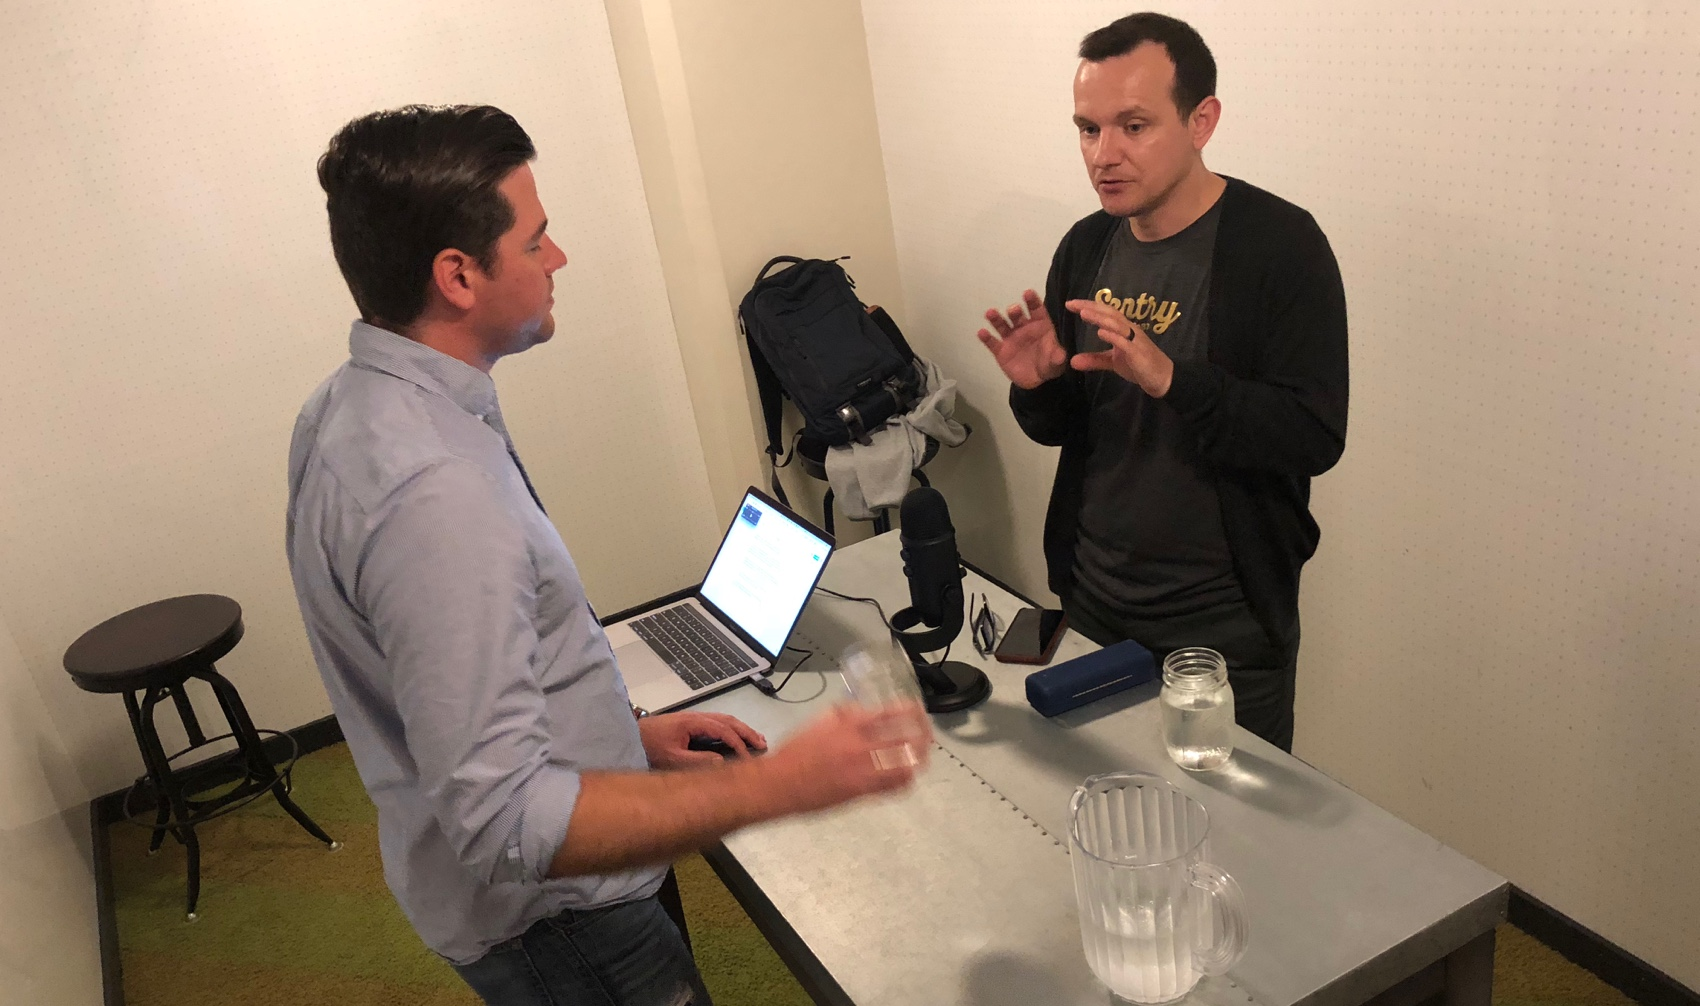 Bjoern Zinssmeister interviewing Vlad Cretu on The Engineering Hangout